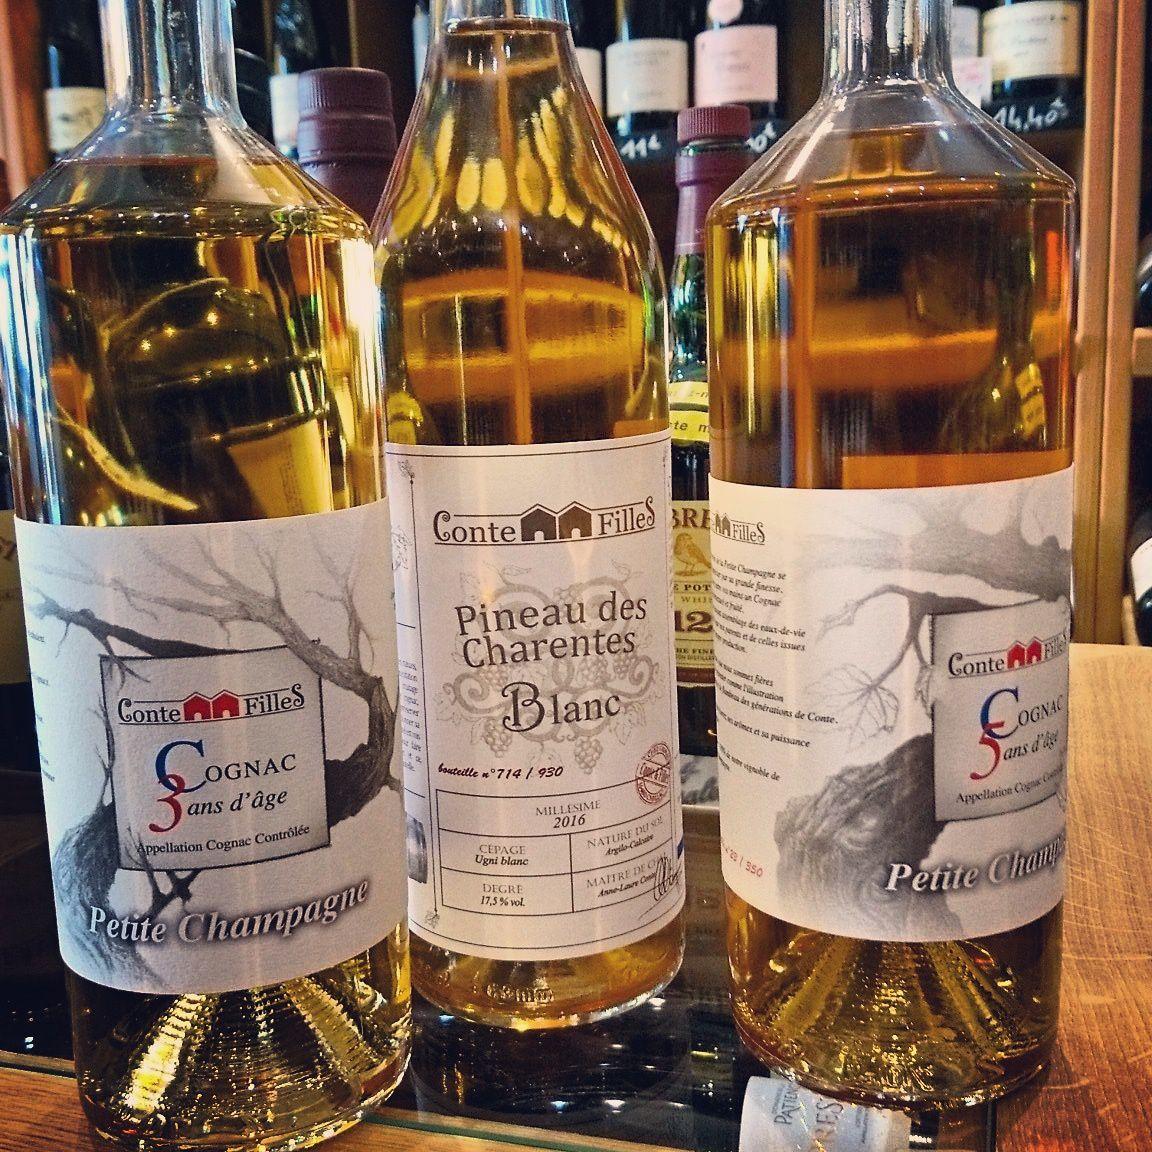 Cognac Conte Filles